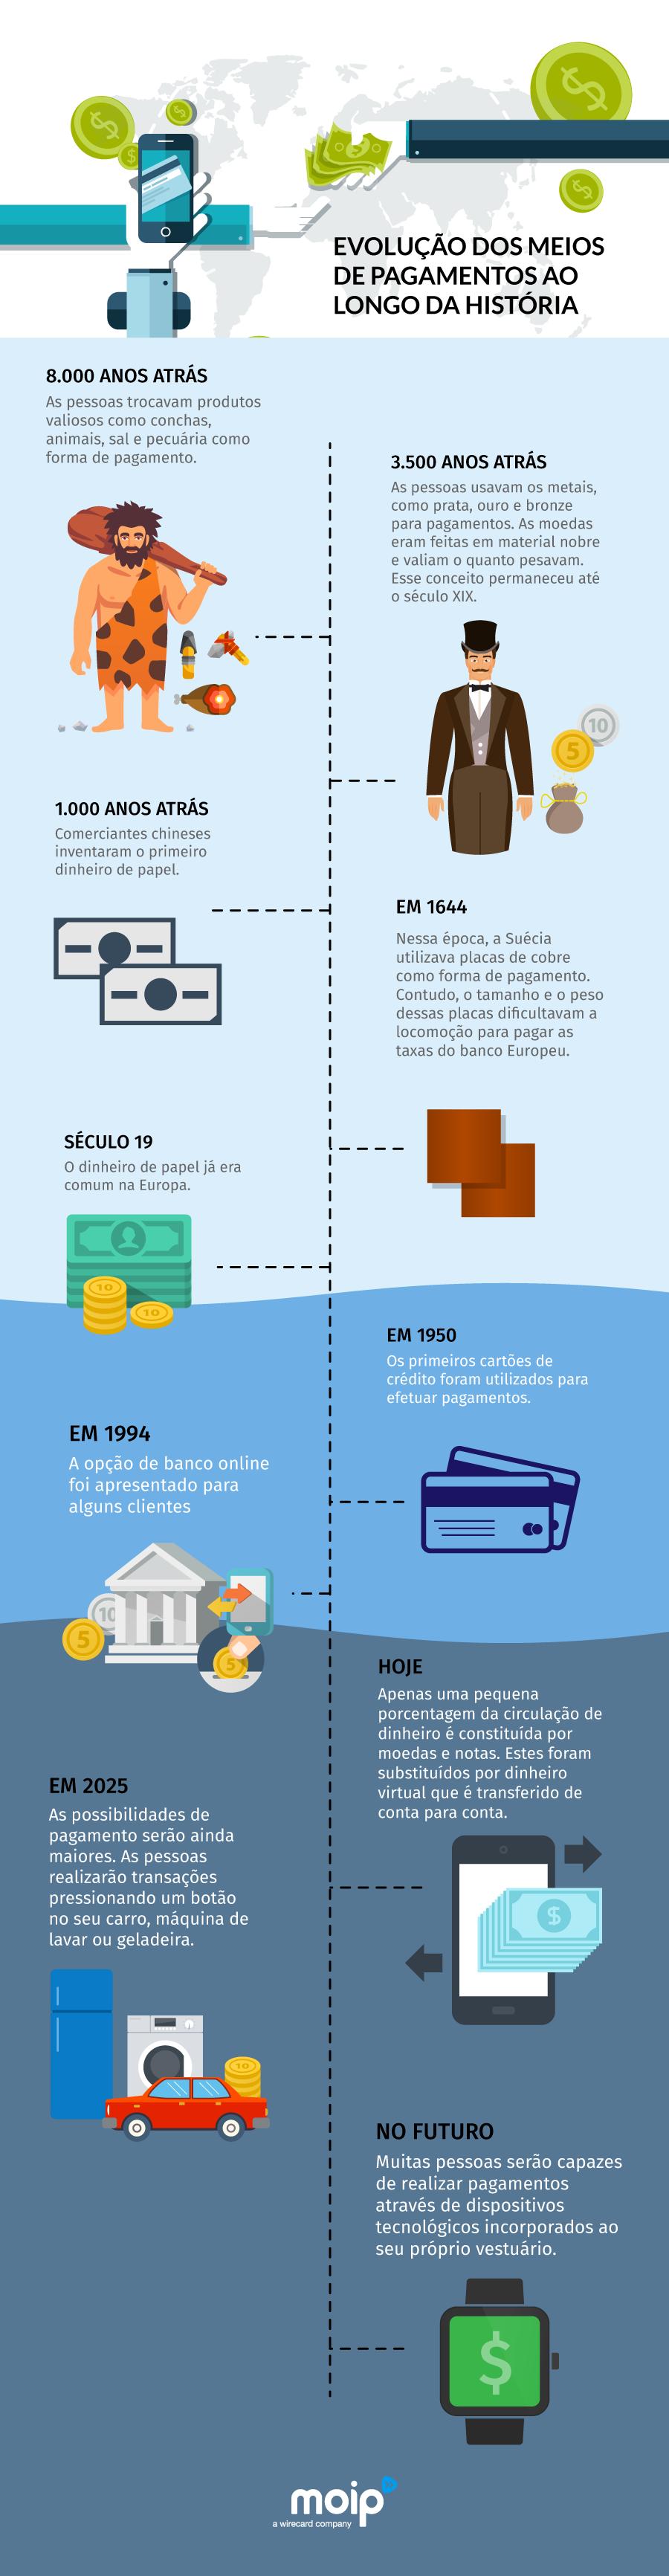 receber pagamentos online - inforgrafico